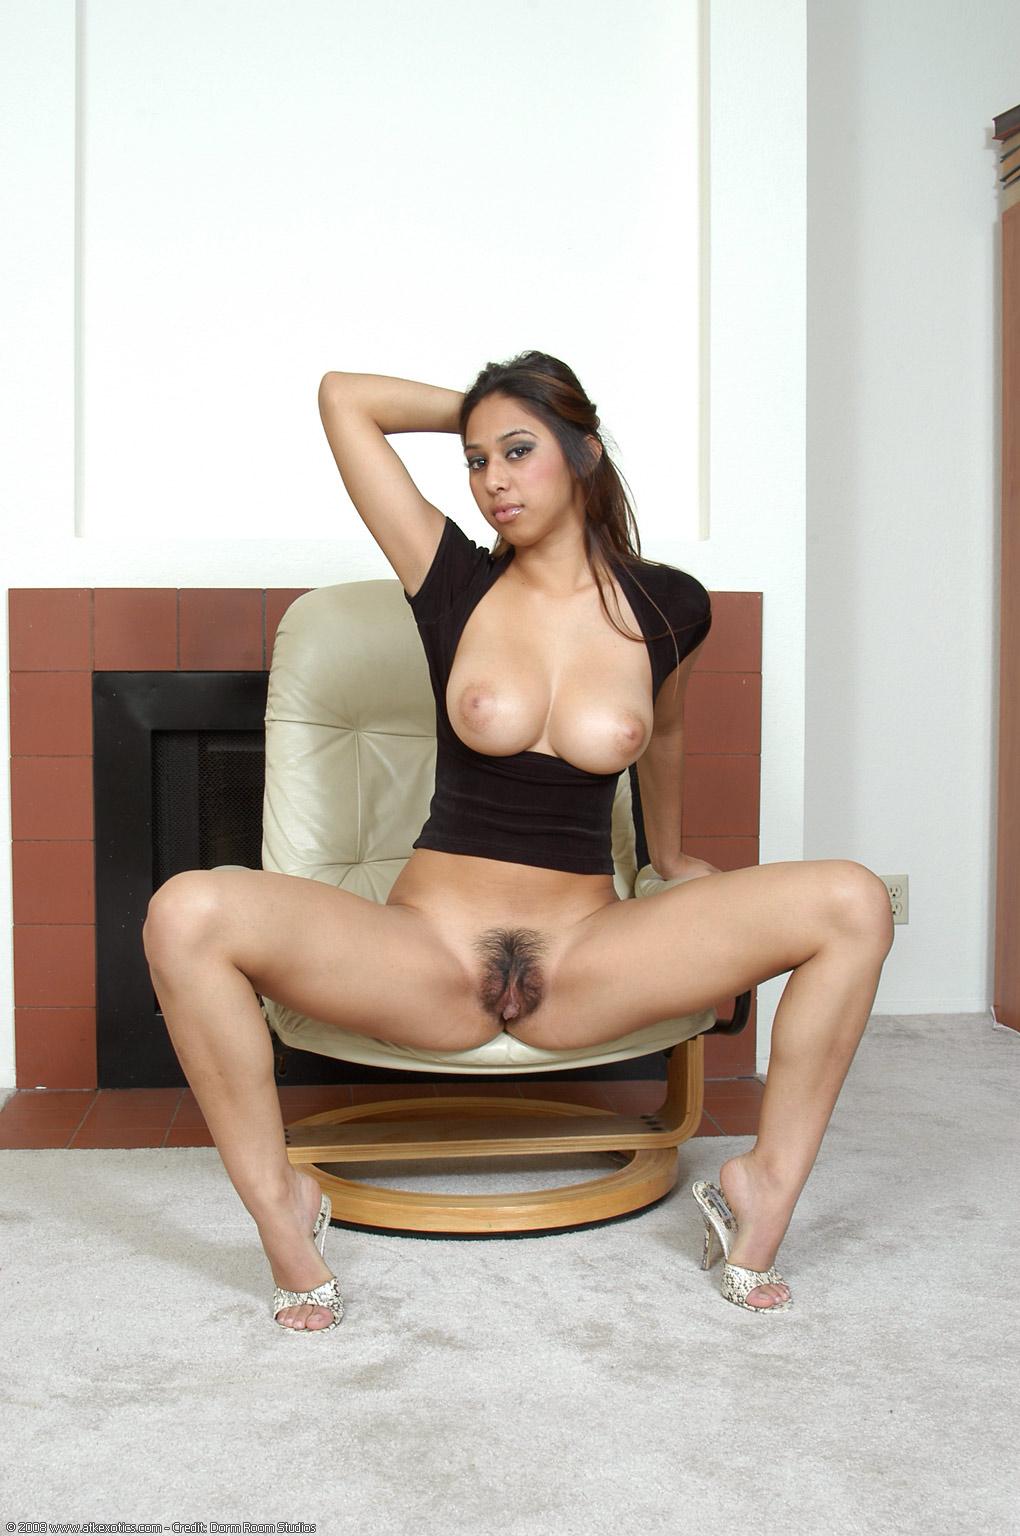 interesting. Prompt, where hustler playboy porn mags interesting. Tell me